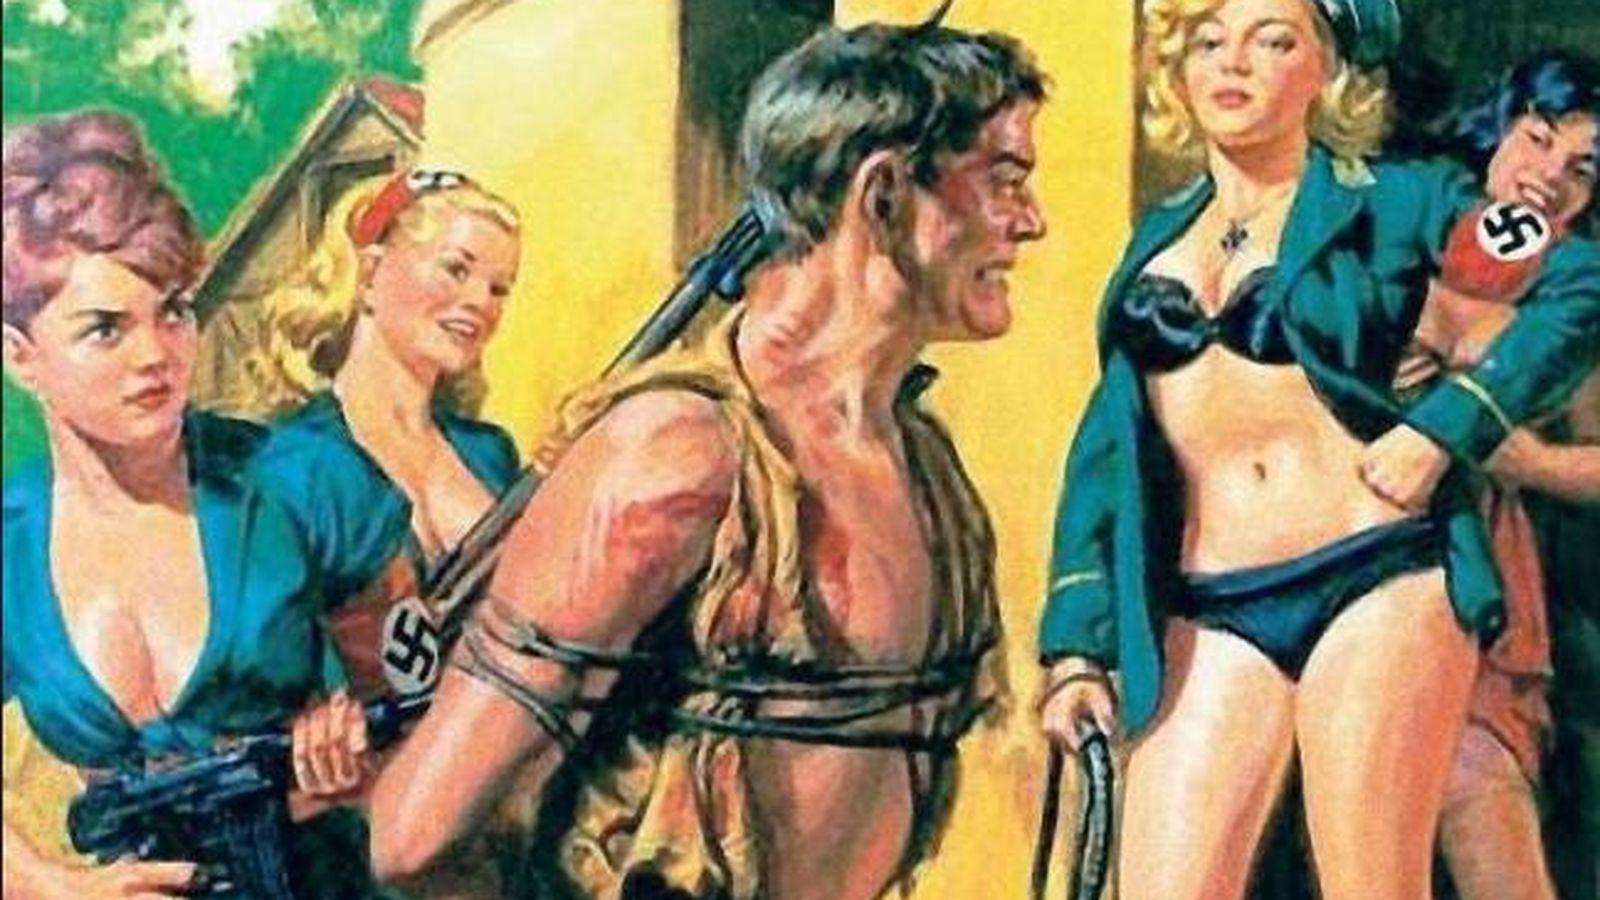 Goldie hawn nude pic